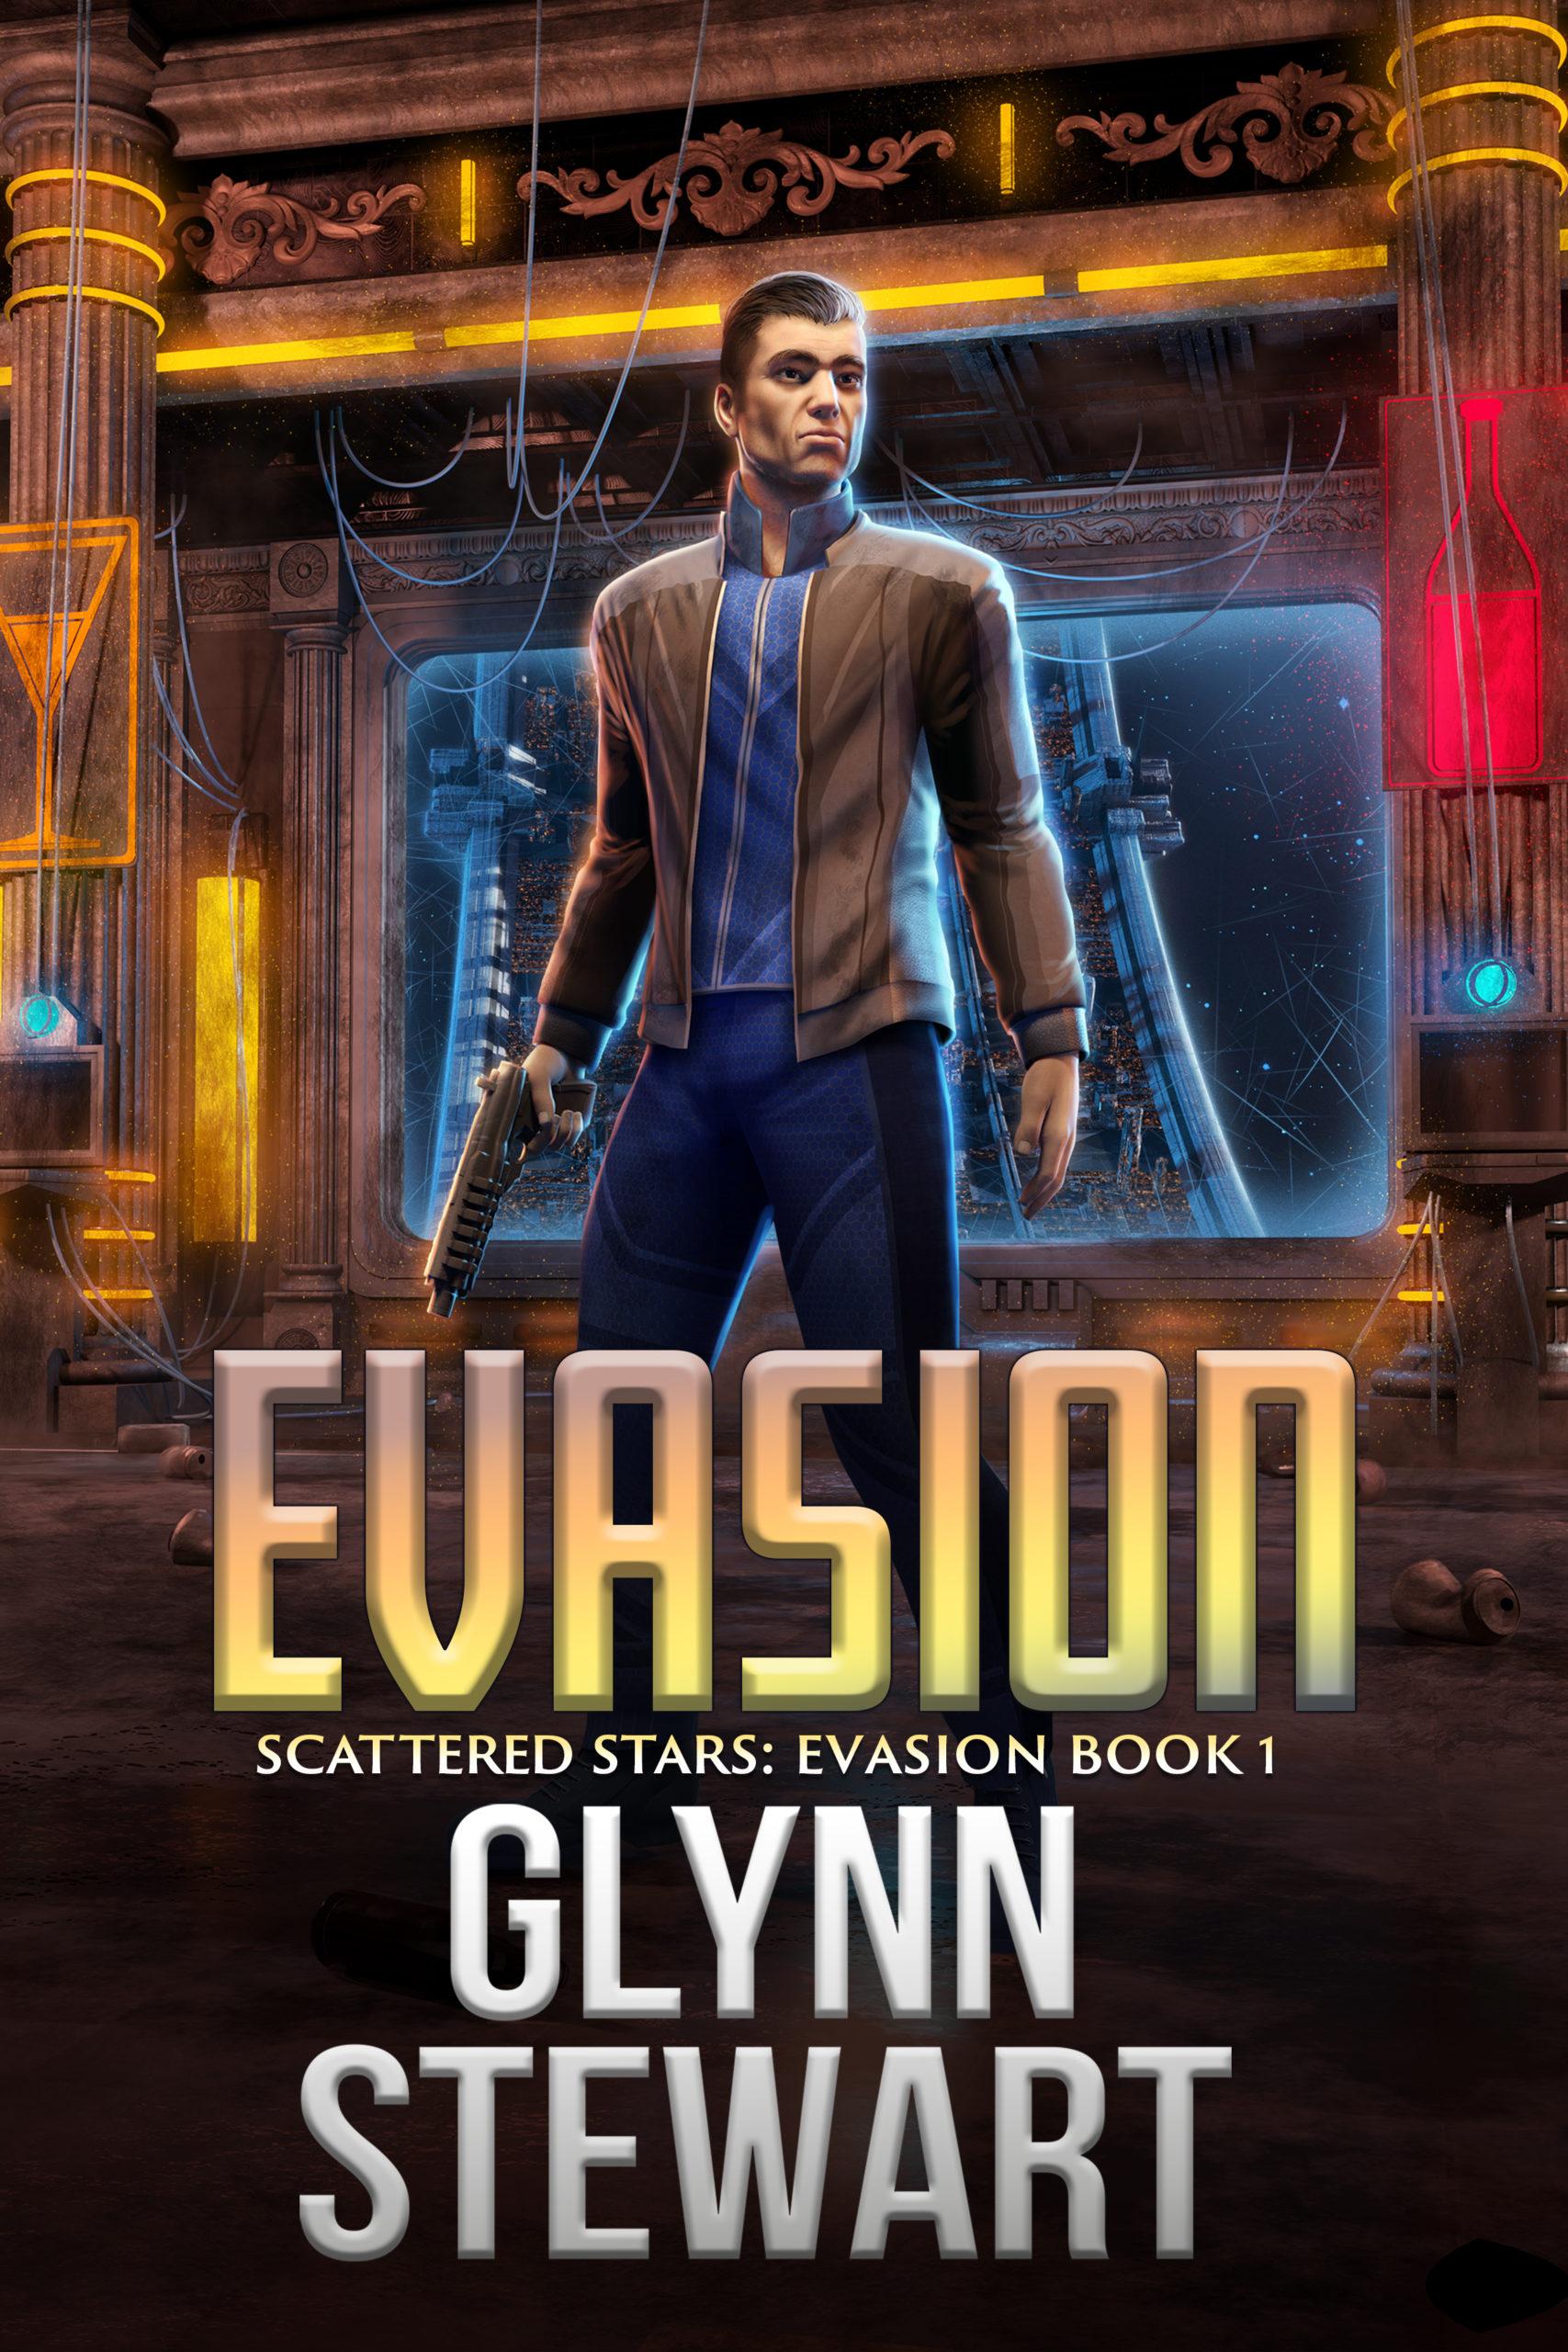 https://www.glynnstewart.com/wp-content/uploads/2021/11/evasion-ebook-large-scaled.jpg